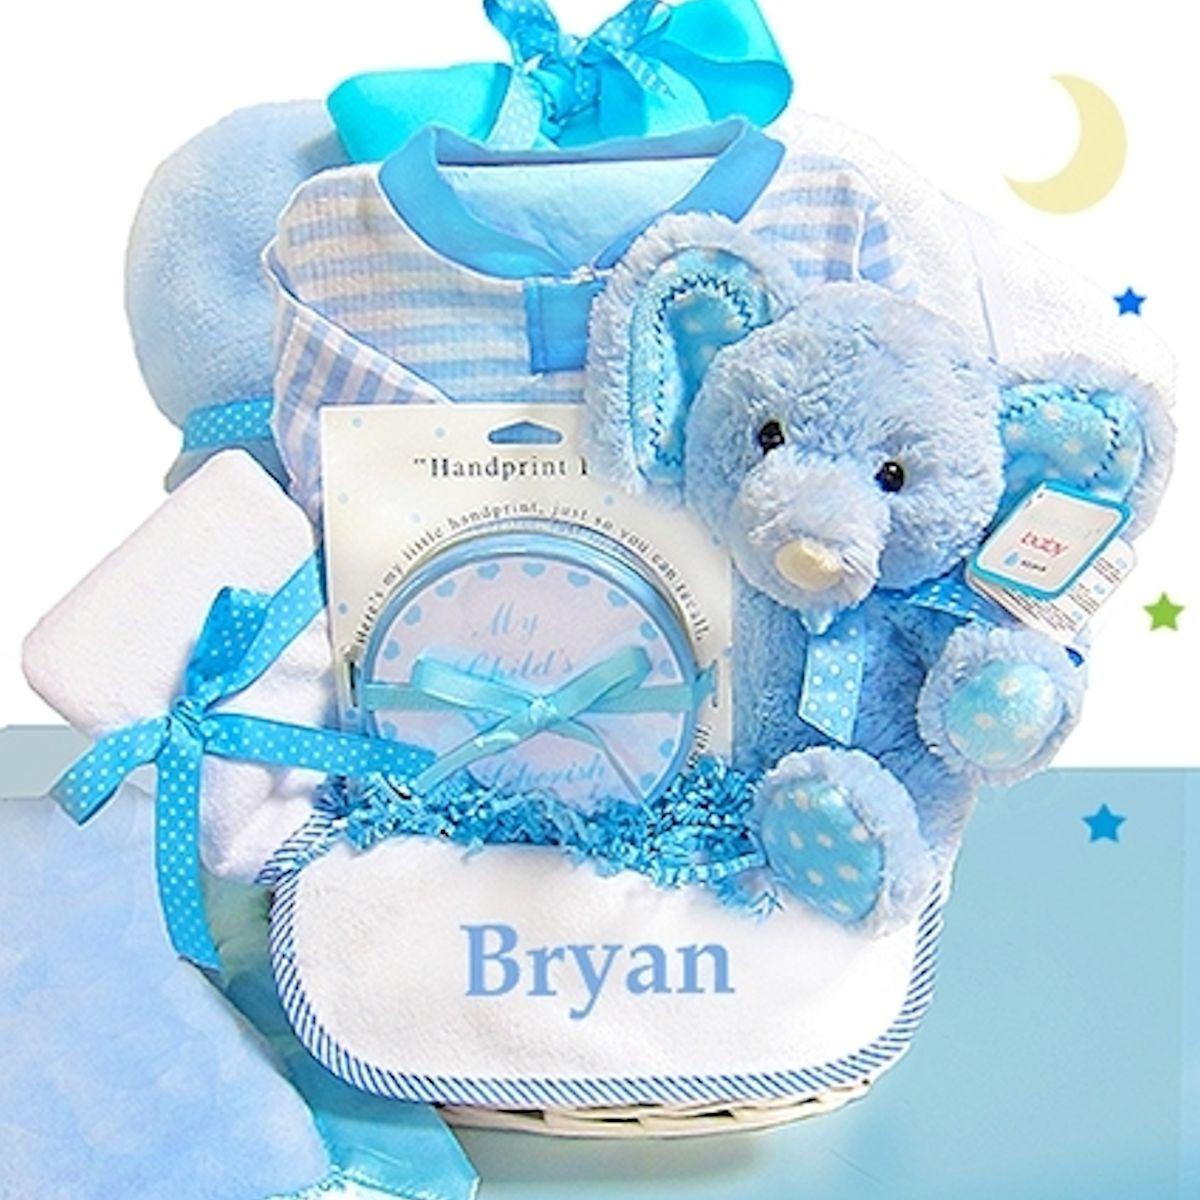 Personalized Baby Boy Gifts  Baby Boy Gift Basket Blue Elephant